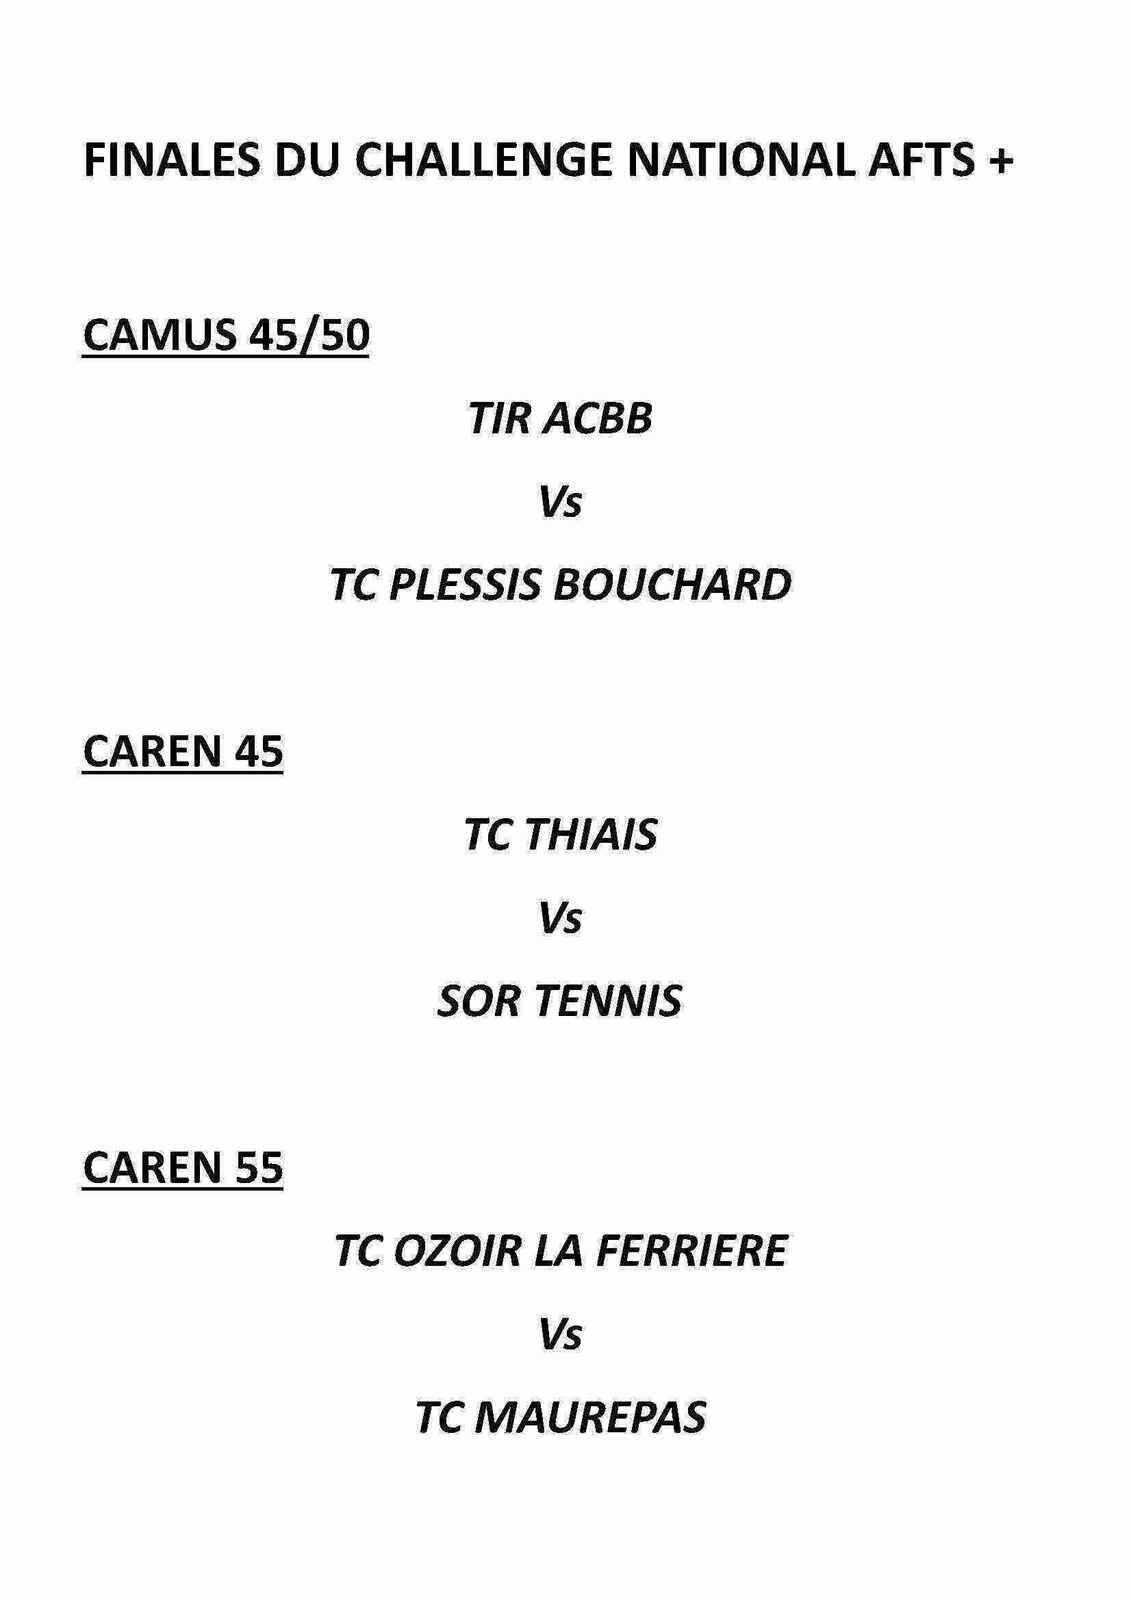 Challenges Caren Camus 45/50/55